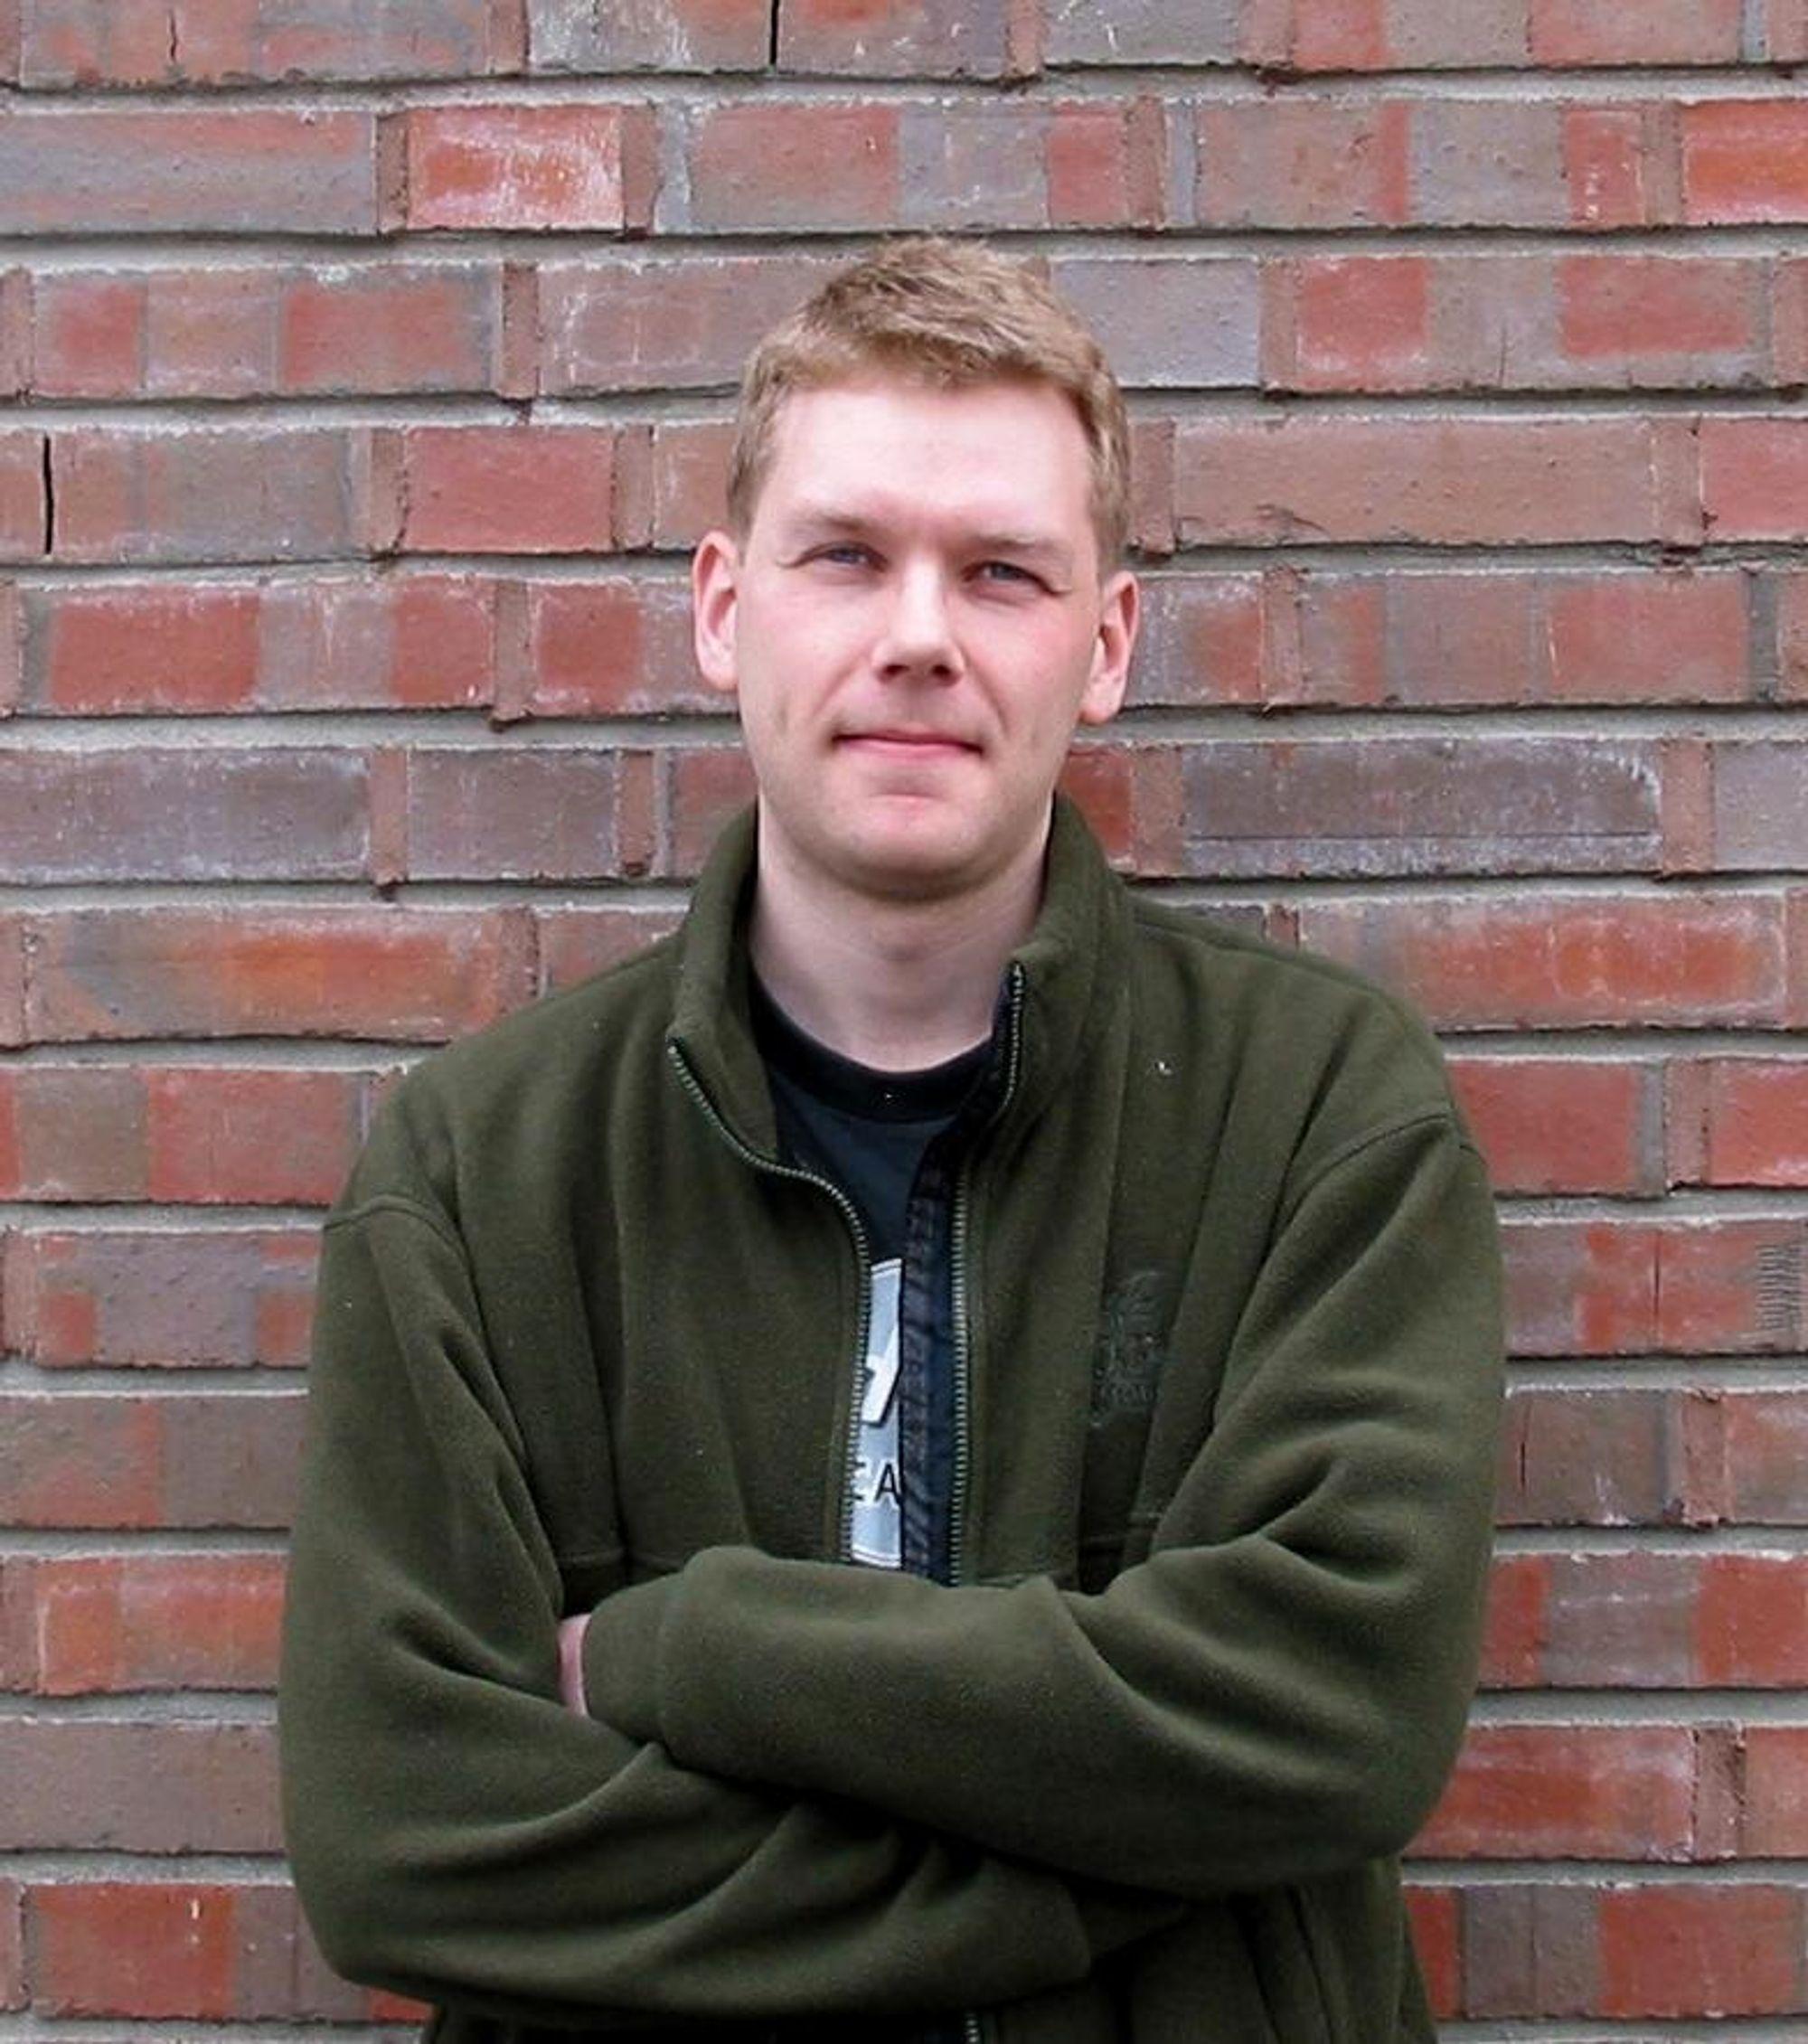 FISKESLO: Doktorgradsstipendiat Stein Ivar Aspmo hevder det ligger uante ressurser i fiskeslo som i dag kastes.